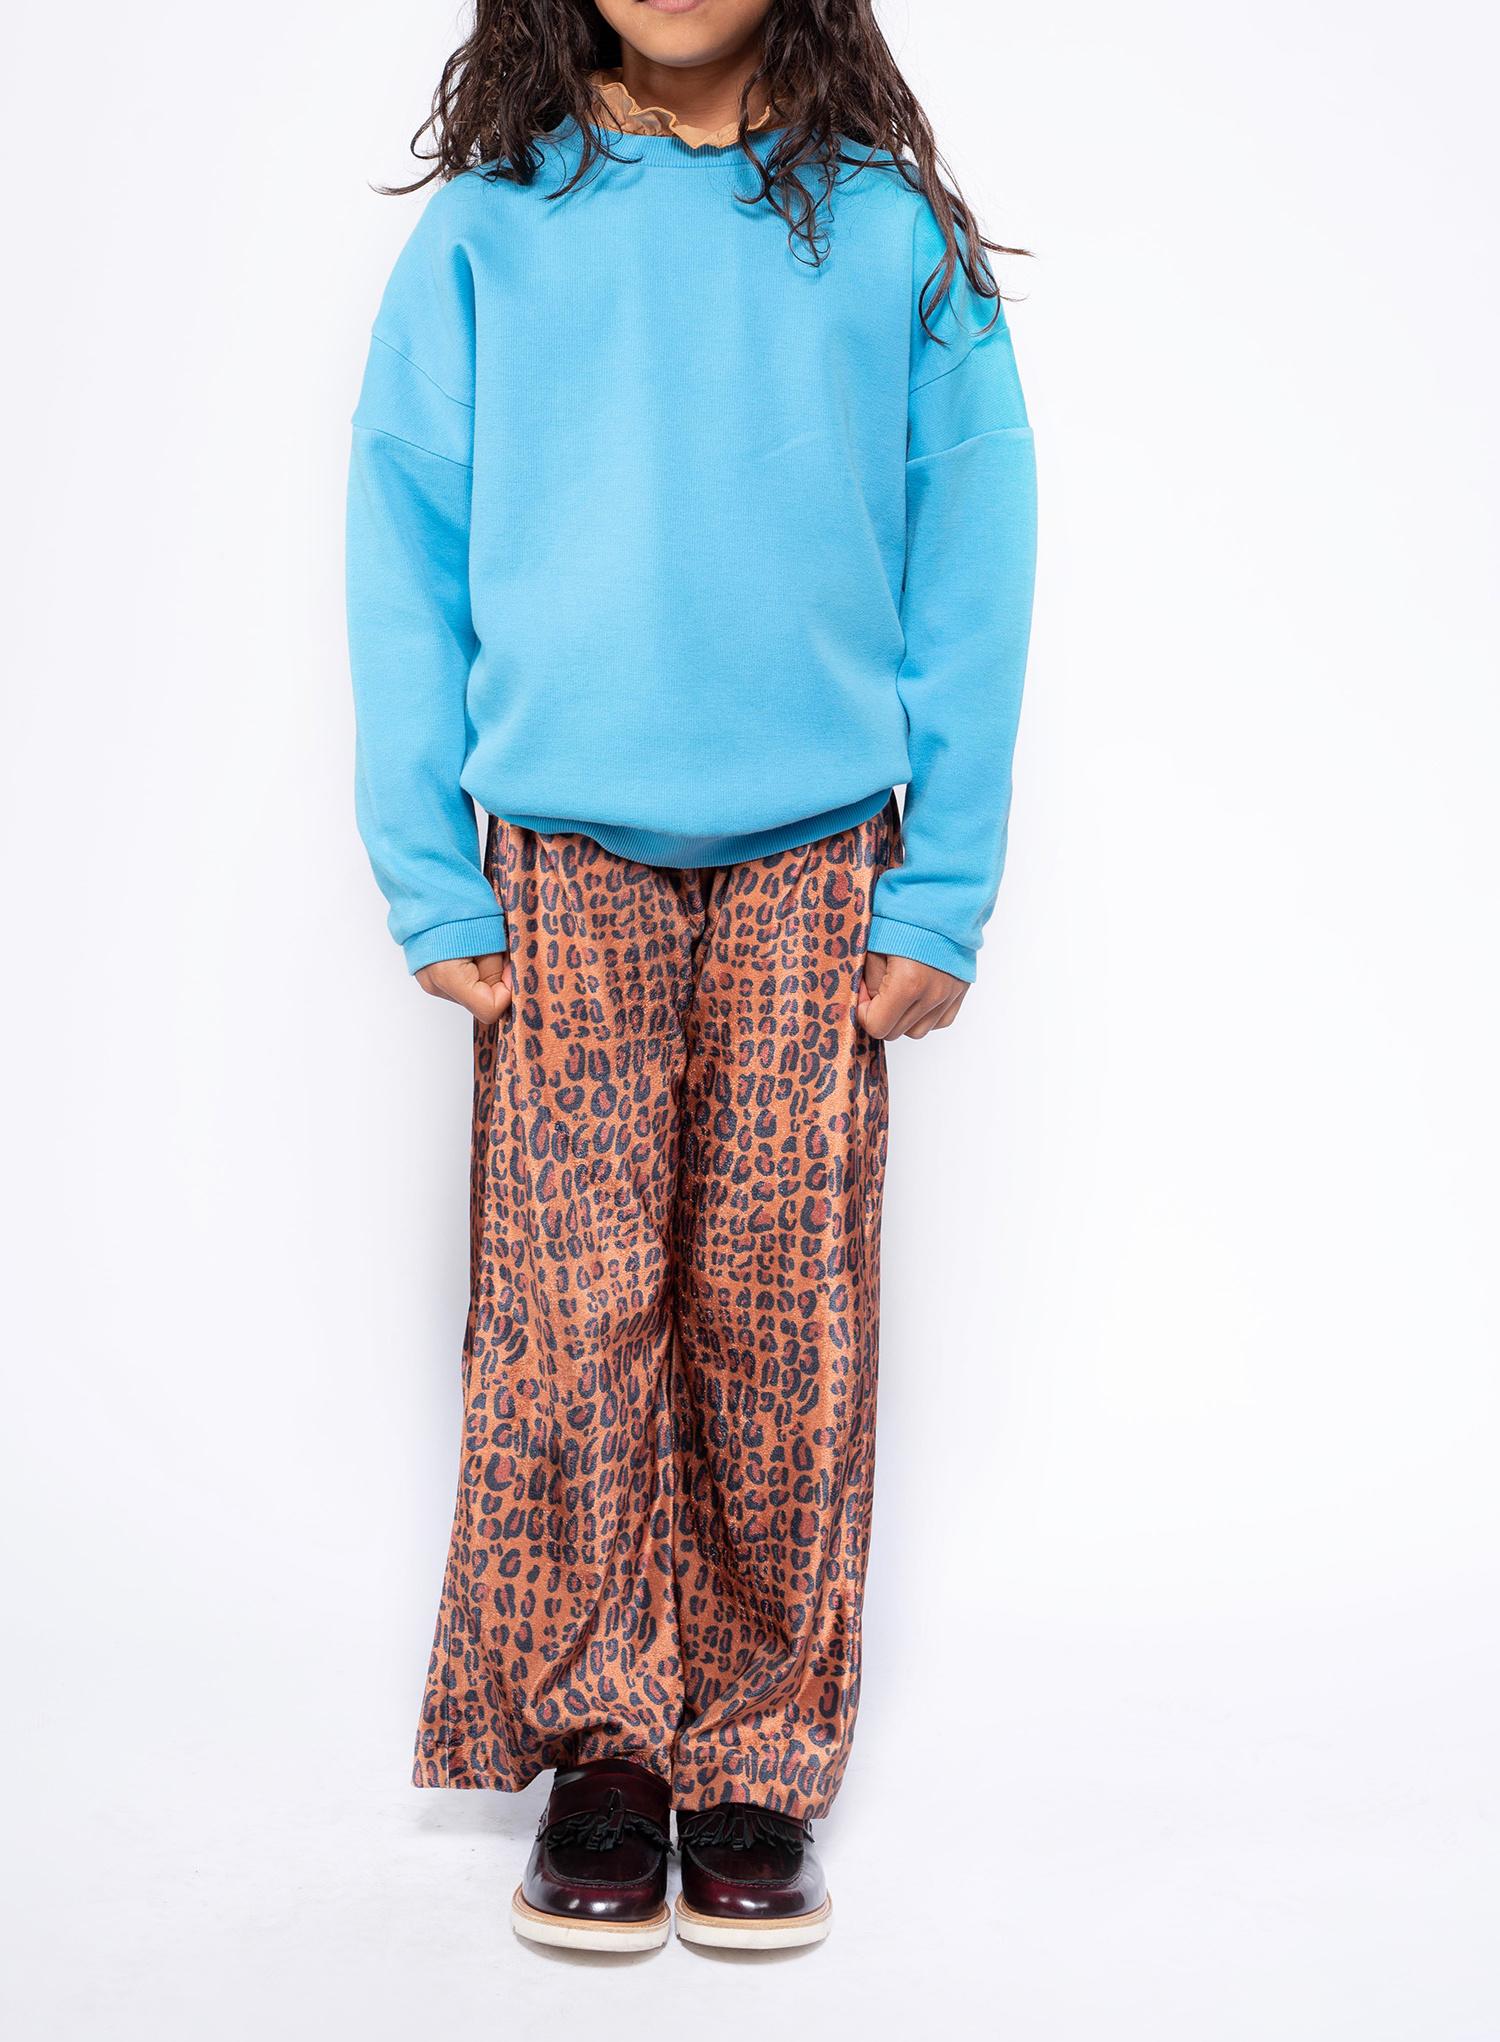 Crewneck sweater - Bright Sky Blue-3